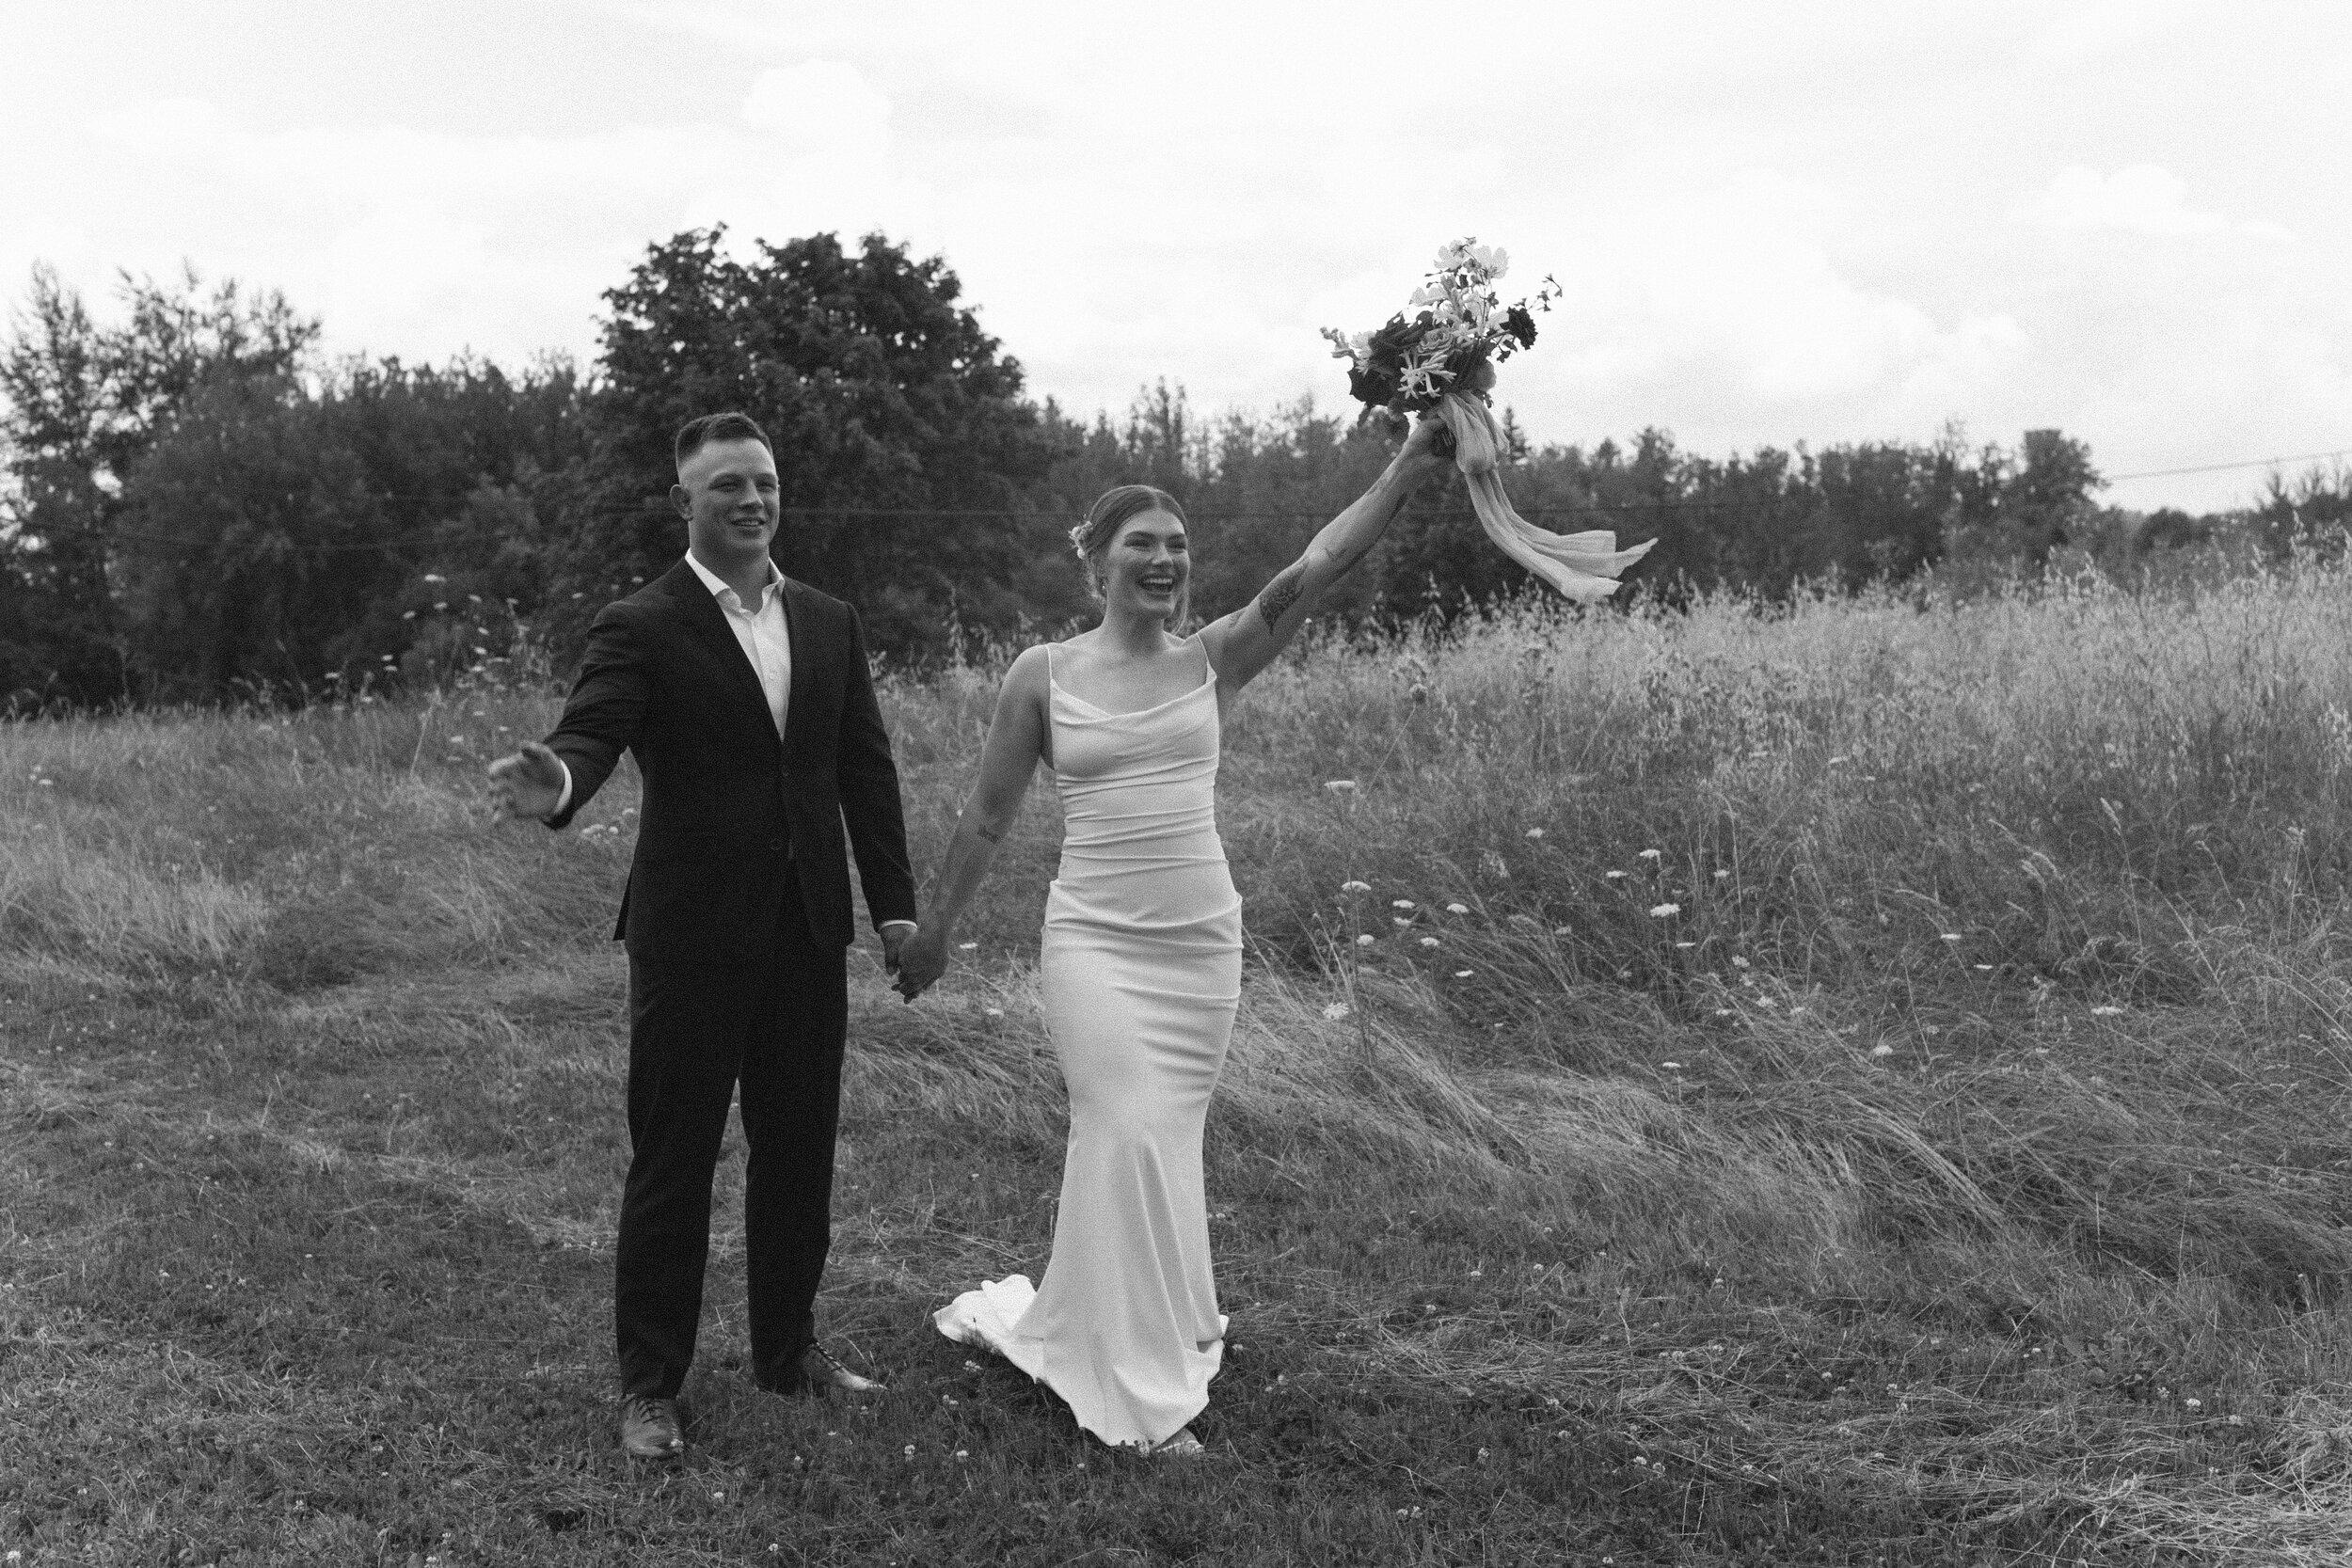 historiccedarschoolwedding_oliviastrohmphotography-64.jpg